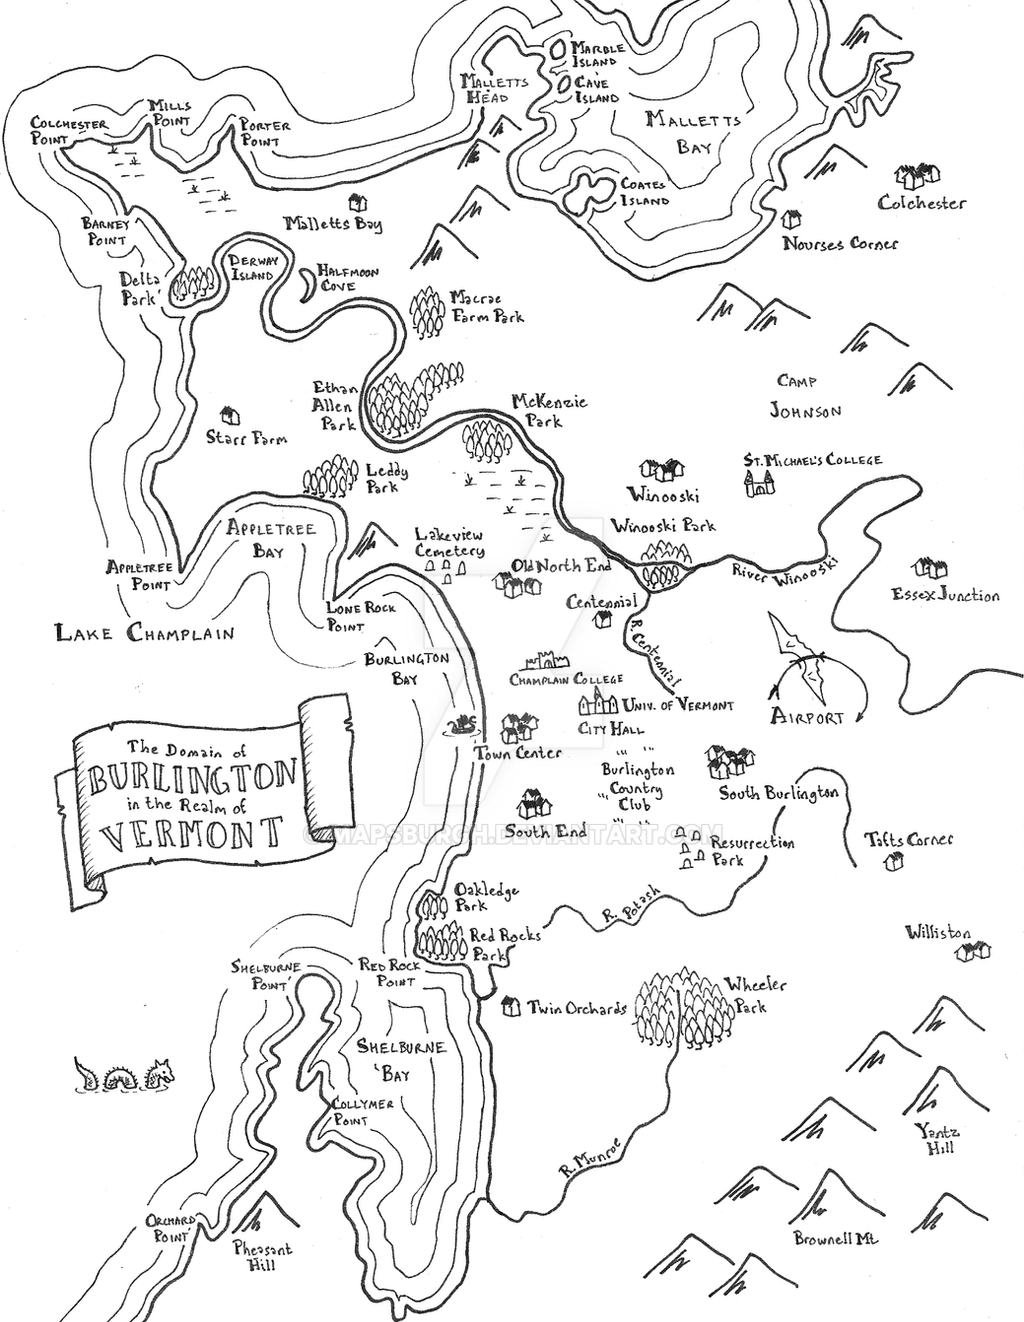 Fantasy map of Burlington, VT by Mapsburgh